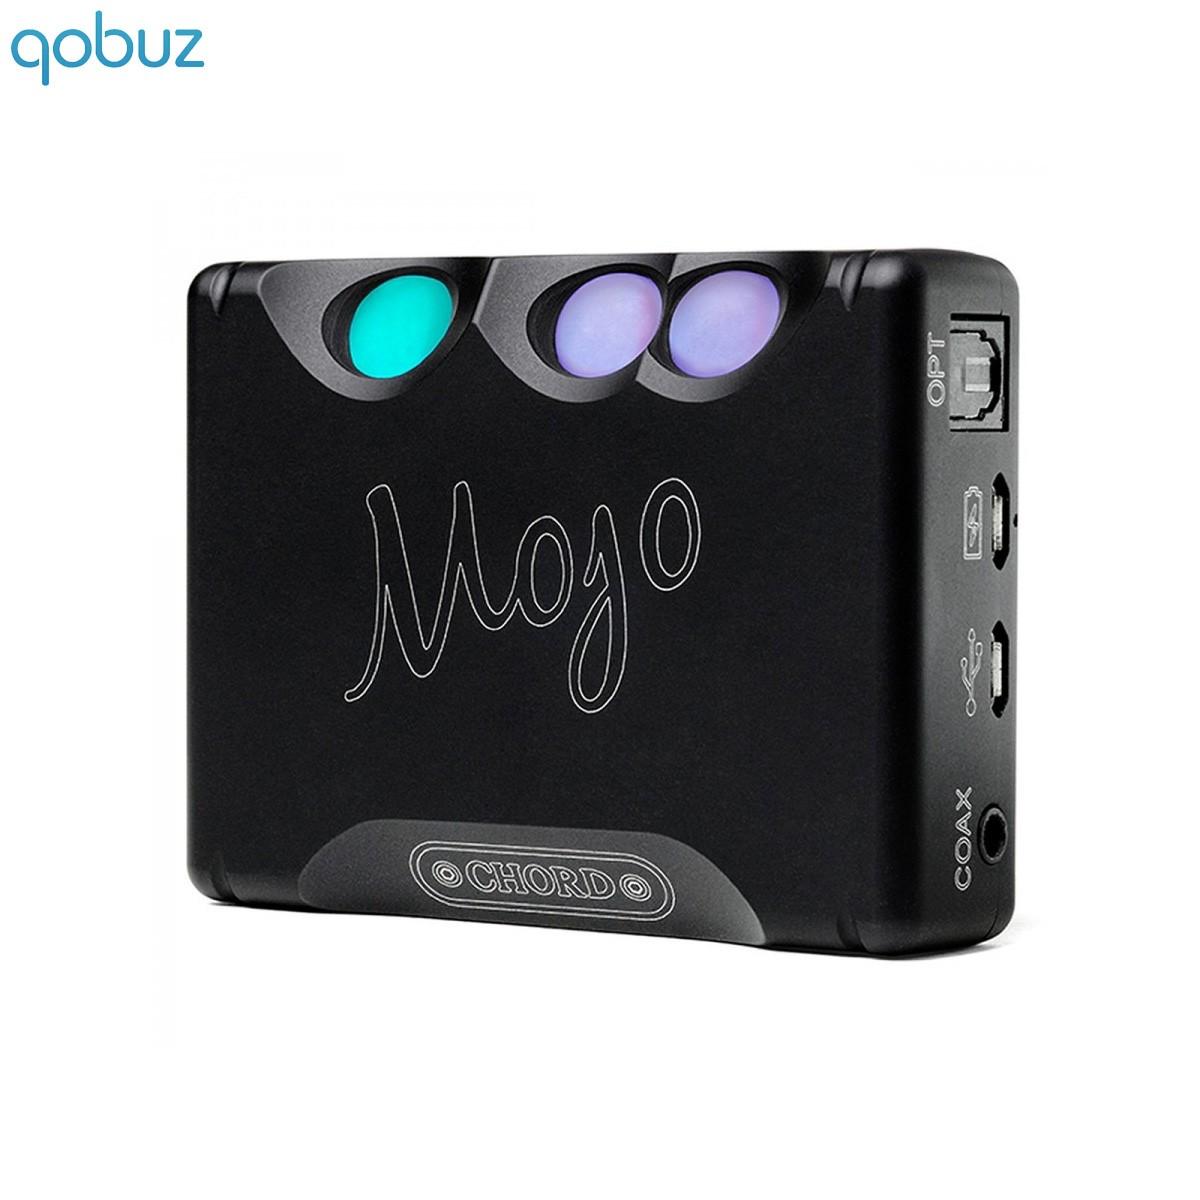 CHORD Mojo Headphone amplifier USB DAC 32bit 768khz Battery Android iOS DSD